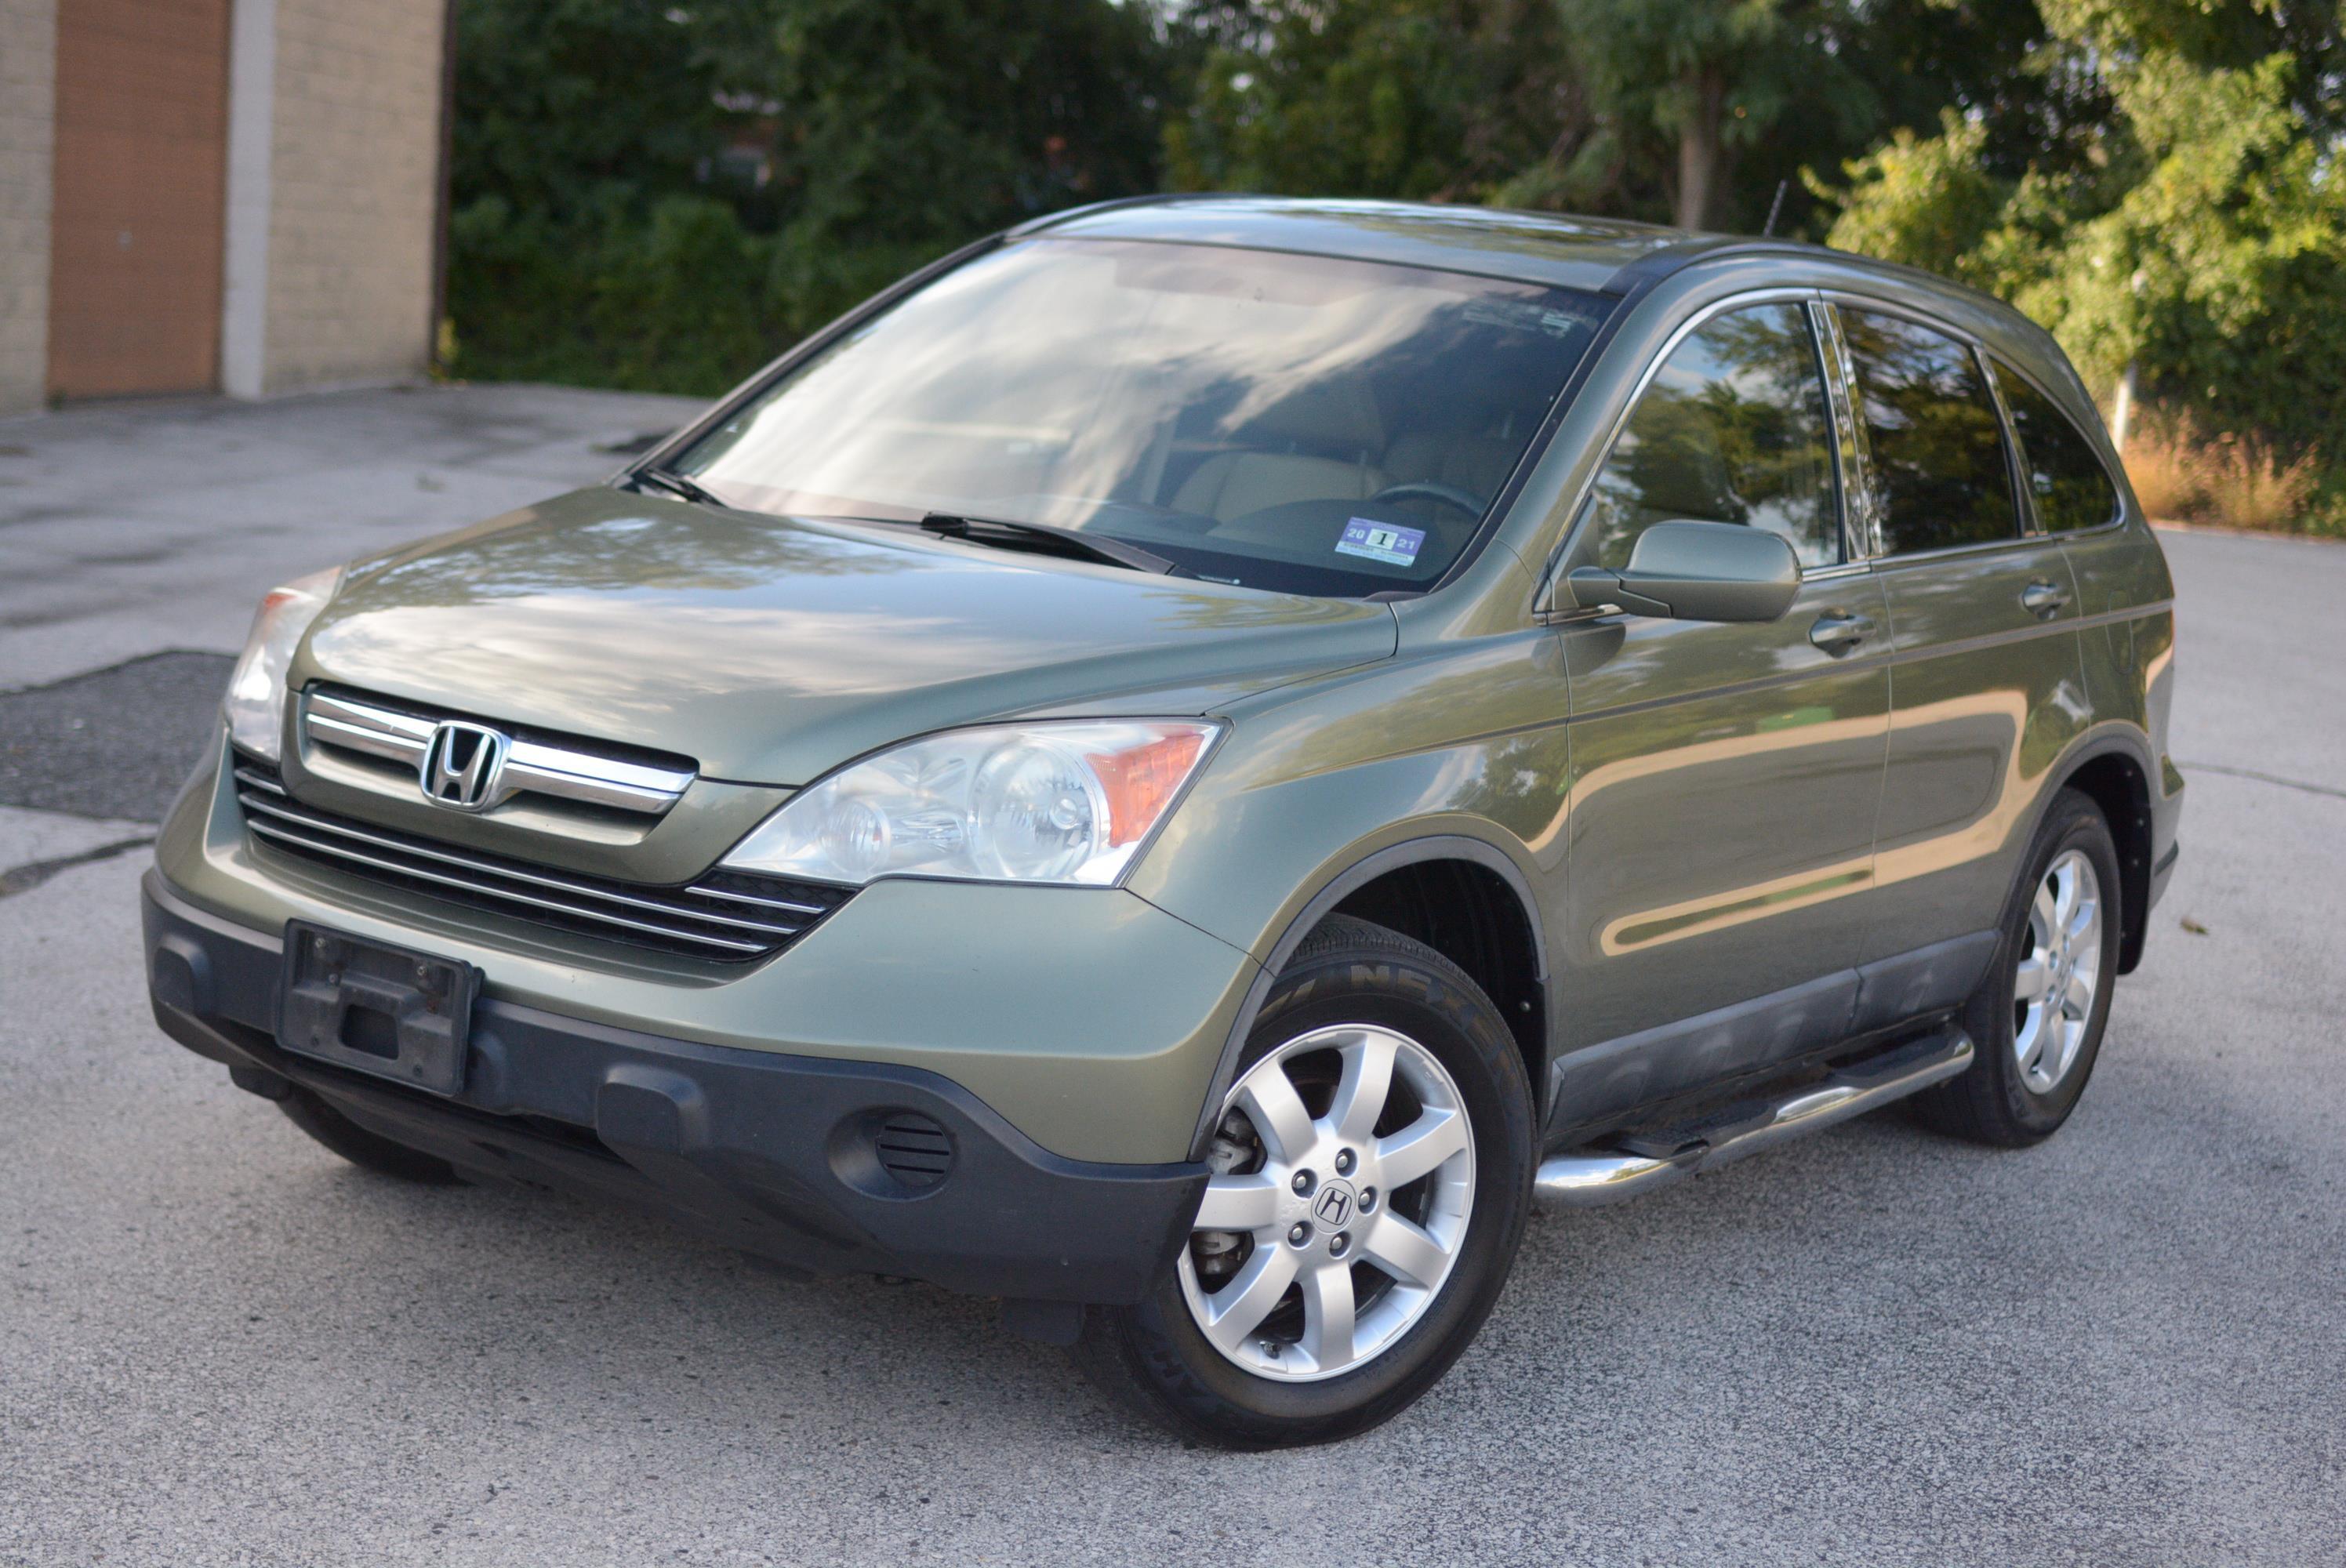 2008 Honda Cr-v Ex-l Runs Good, Leather , Roof , Awd, Cold ...